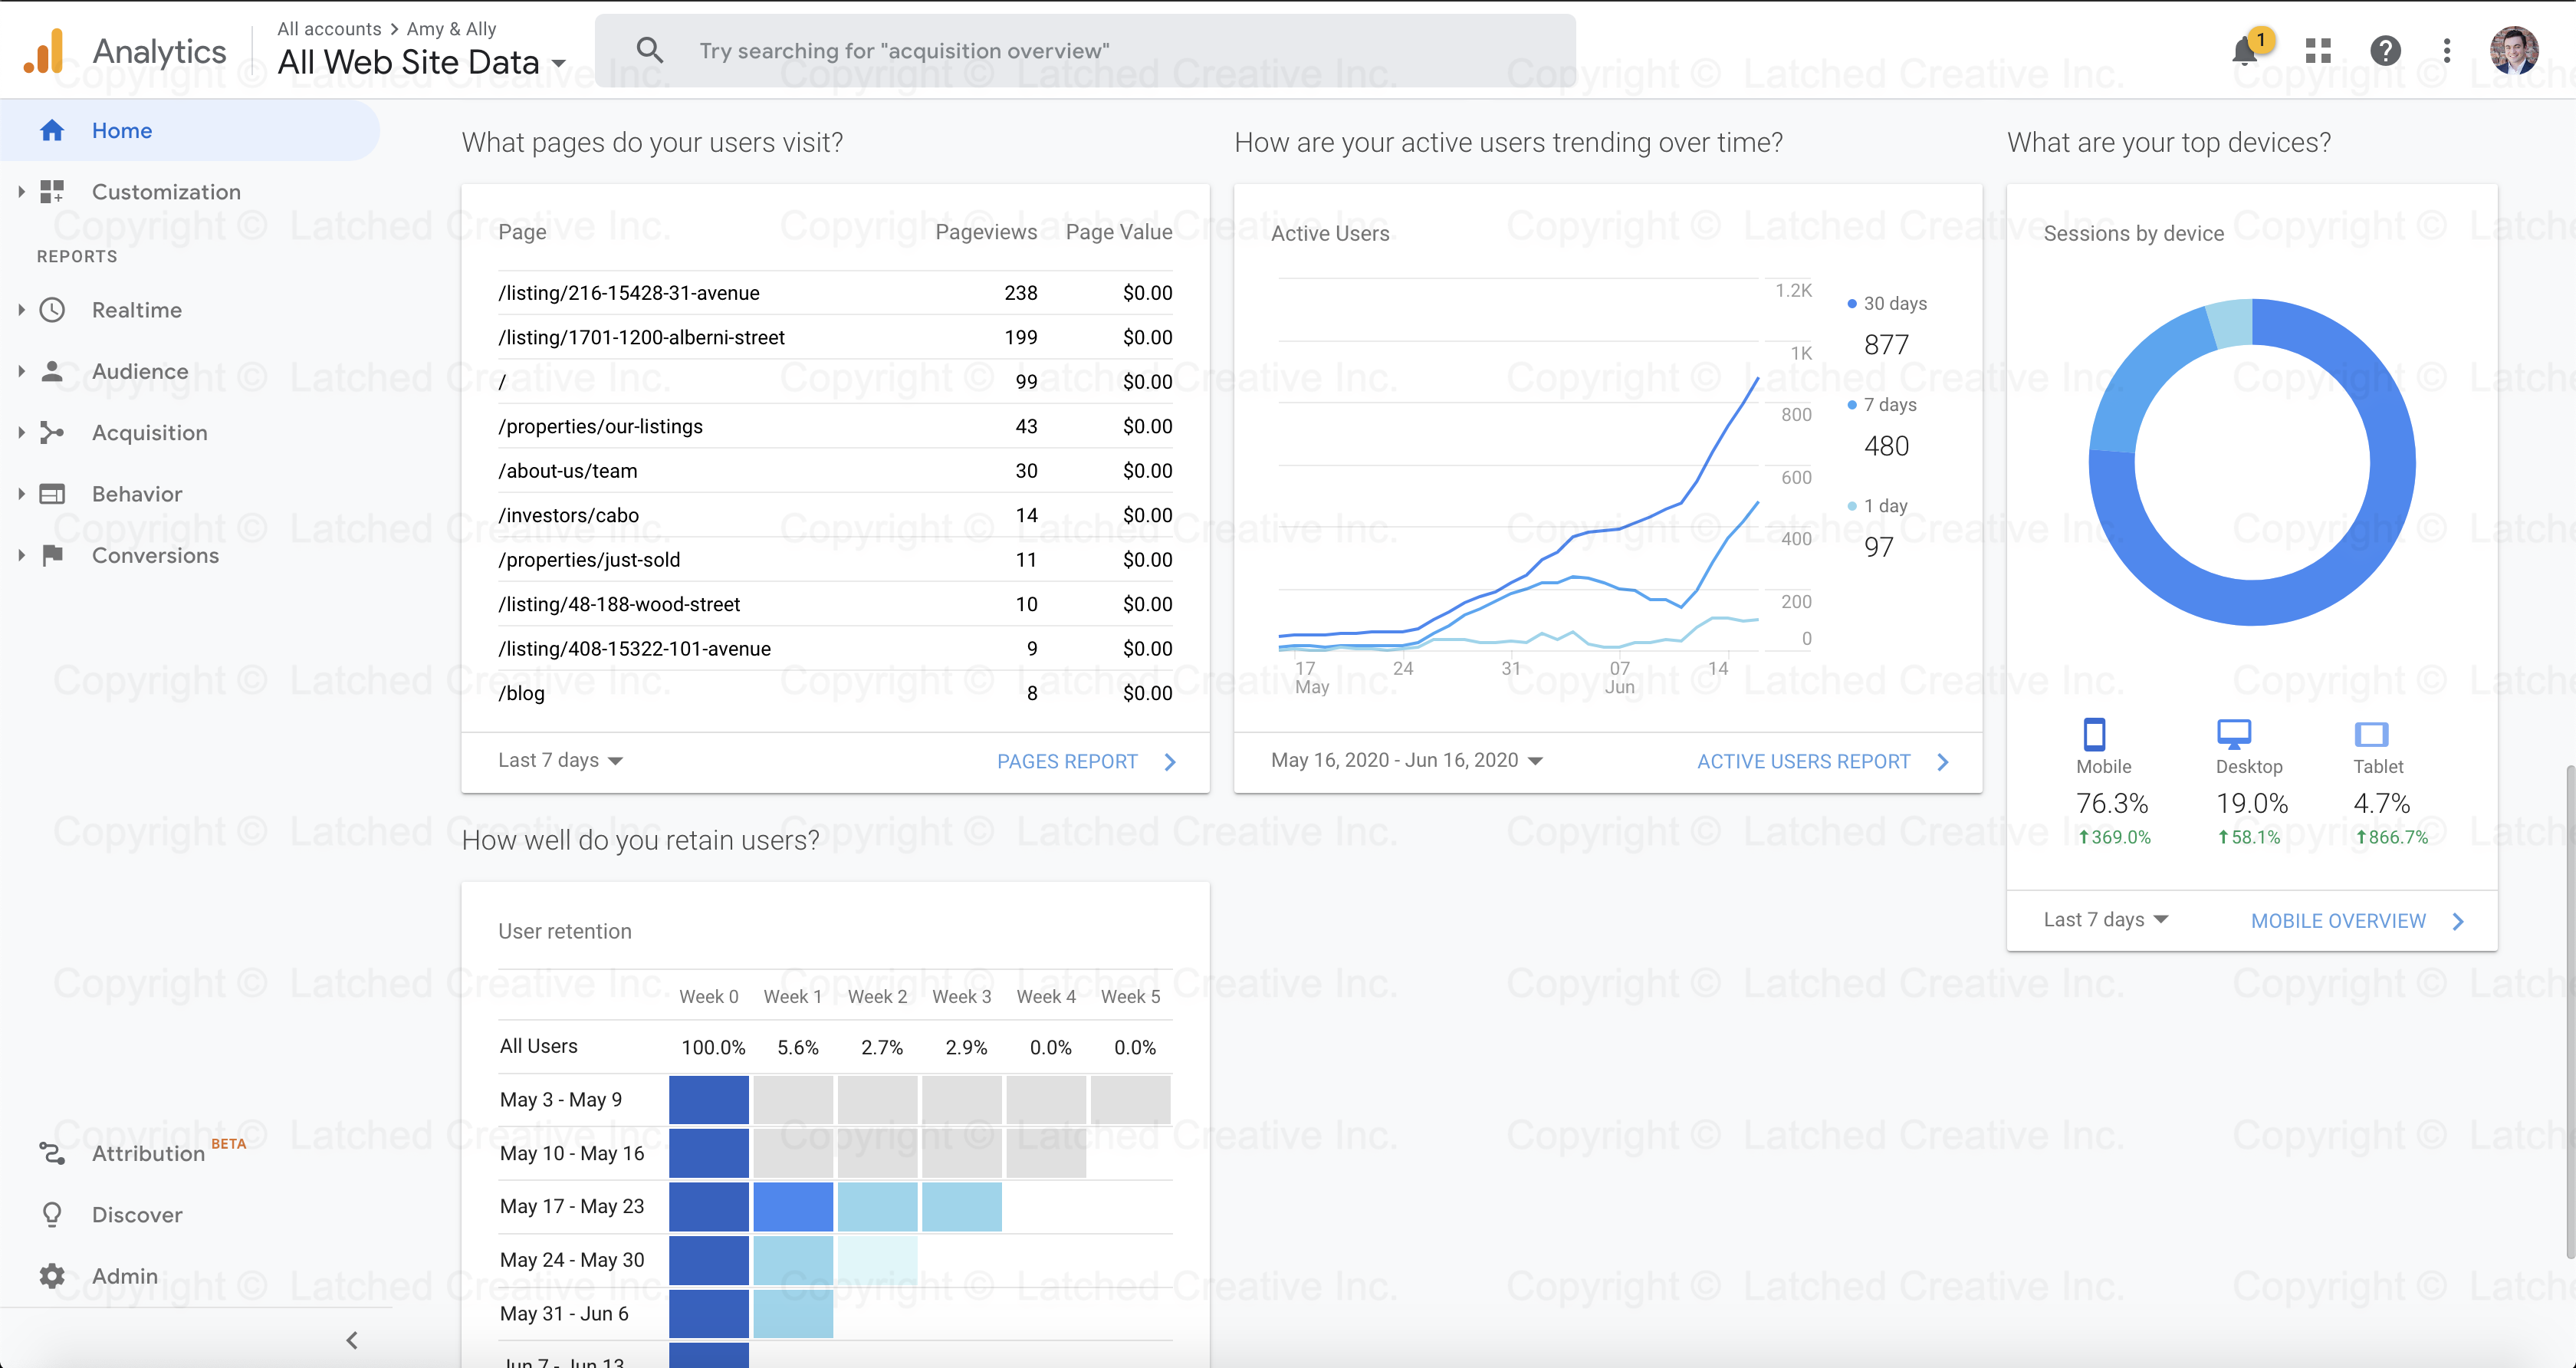 Amy & Ally Google Analytics Data 2